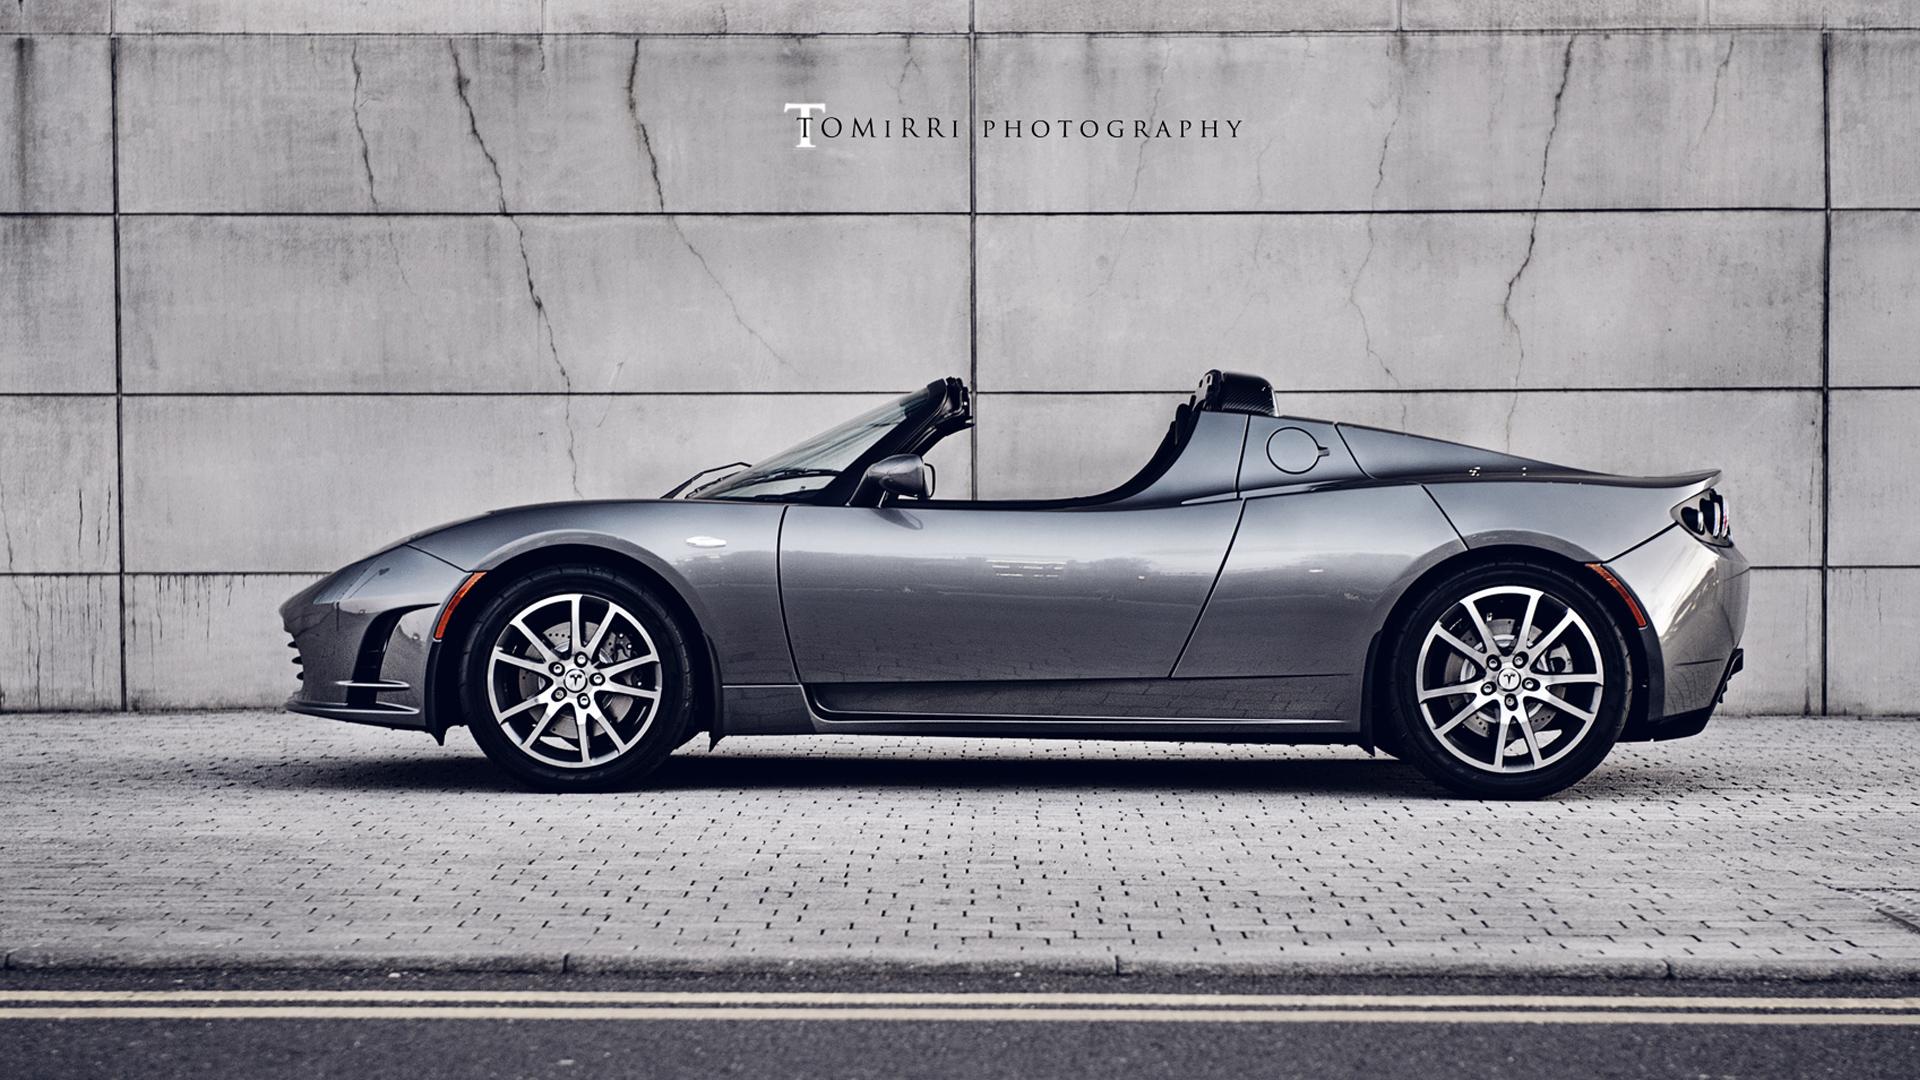 Tesla Roadster Wallpaper Hd Car Wallpapers Id 2539